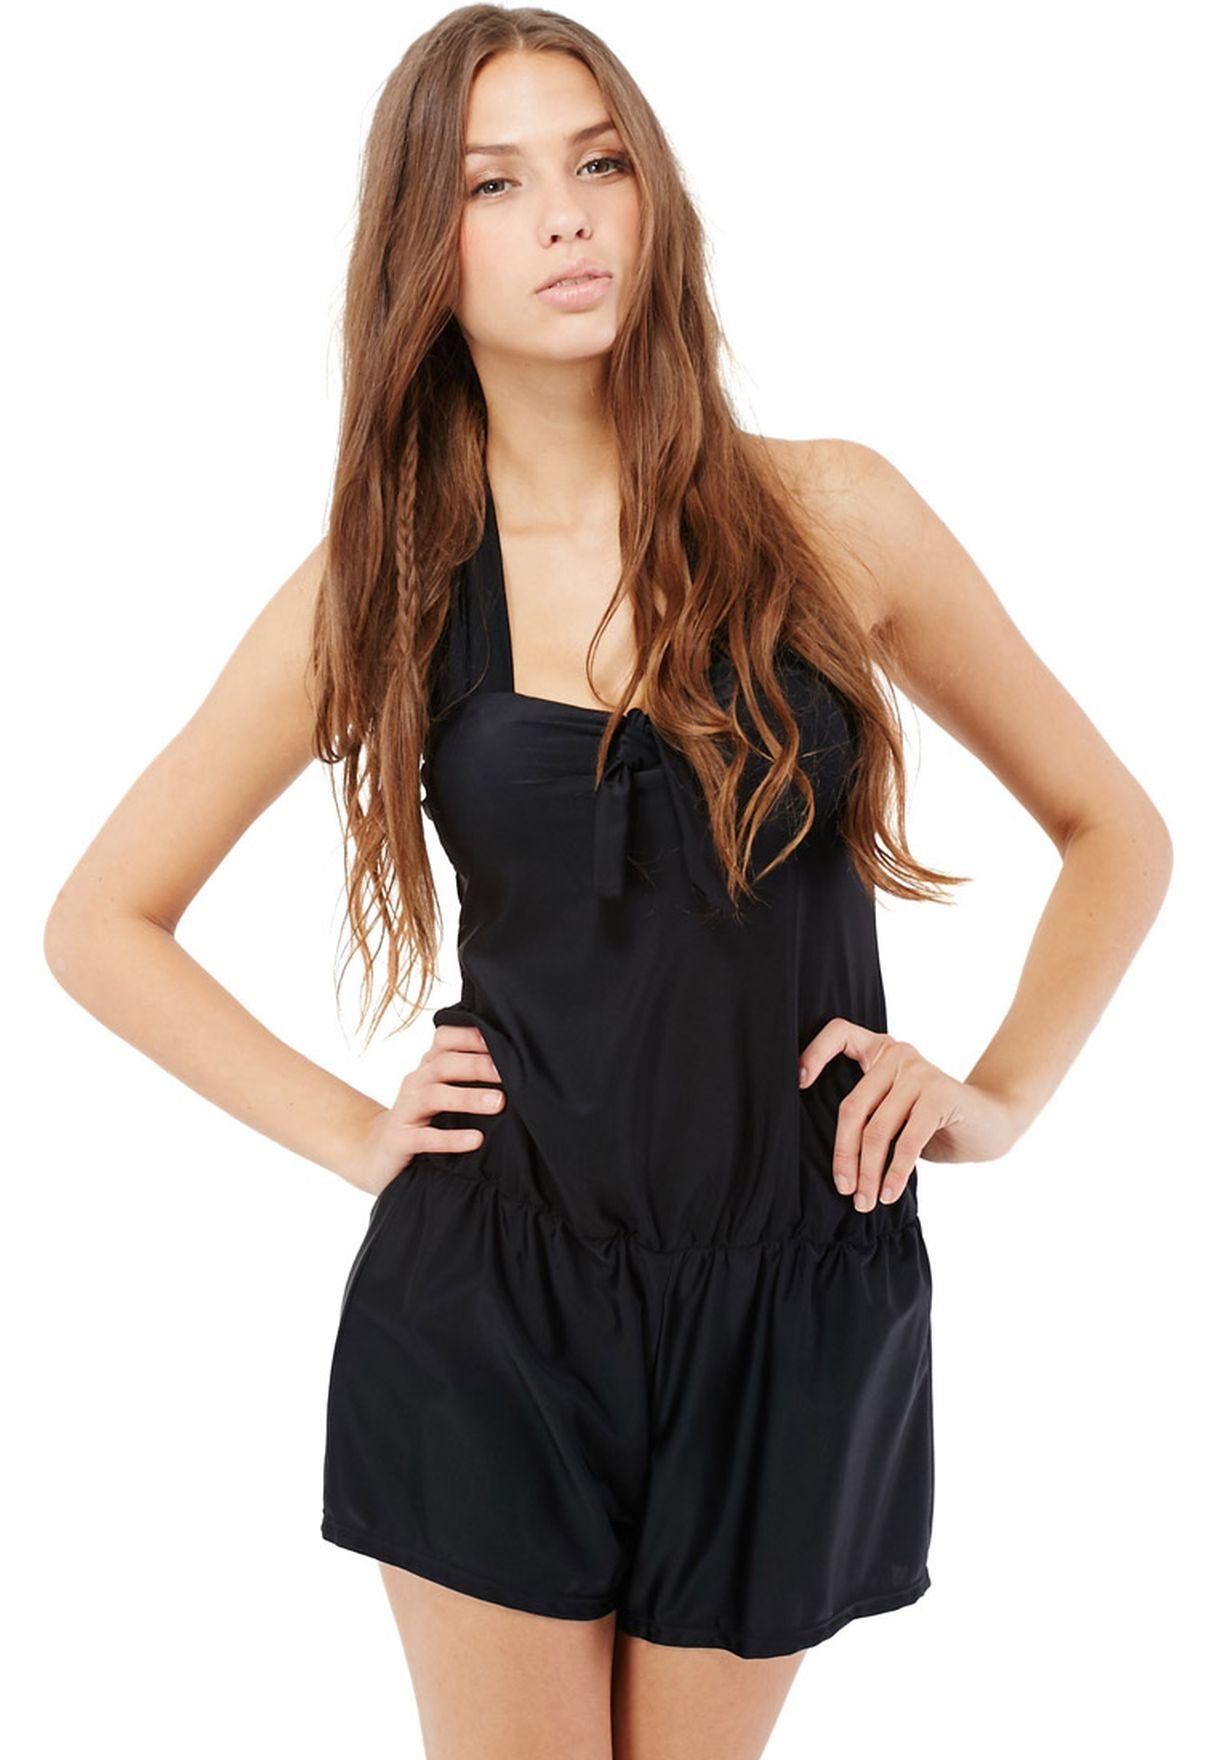 0560dbc6f78 Shop Ginger black Halter Beach Playsuit for Women in Oman - GI121AT04CKD